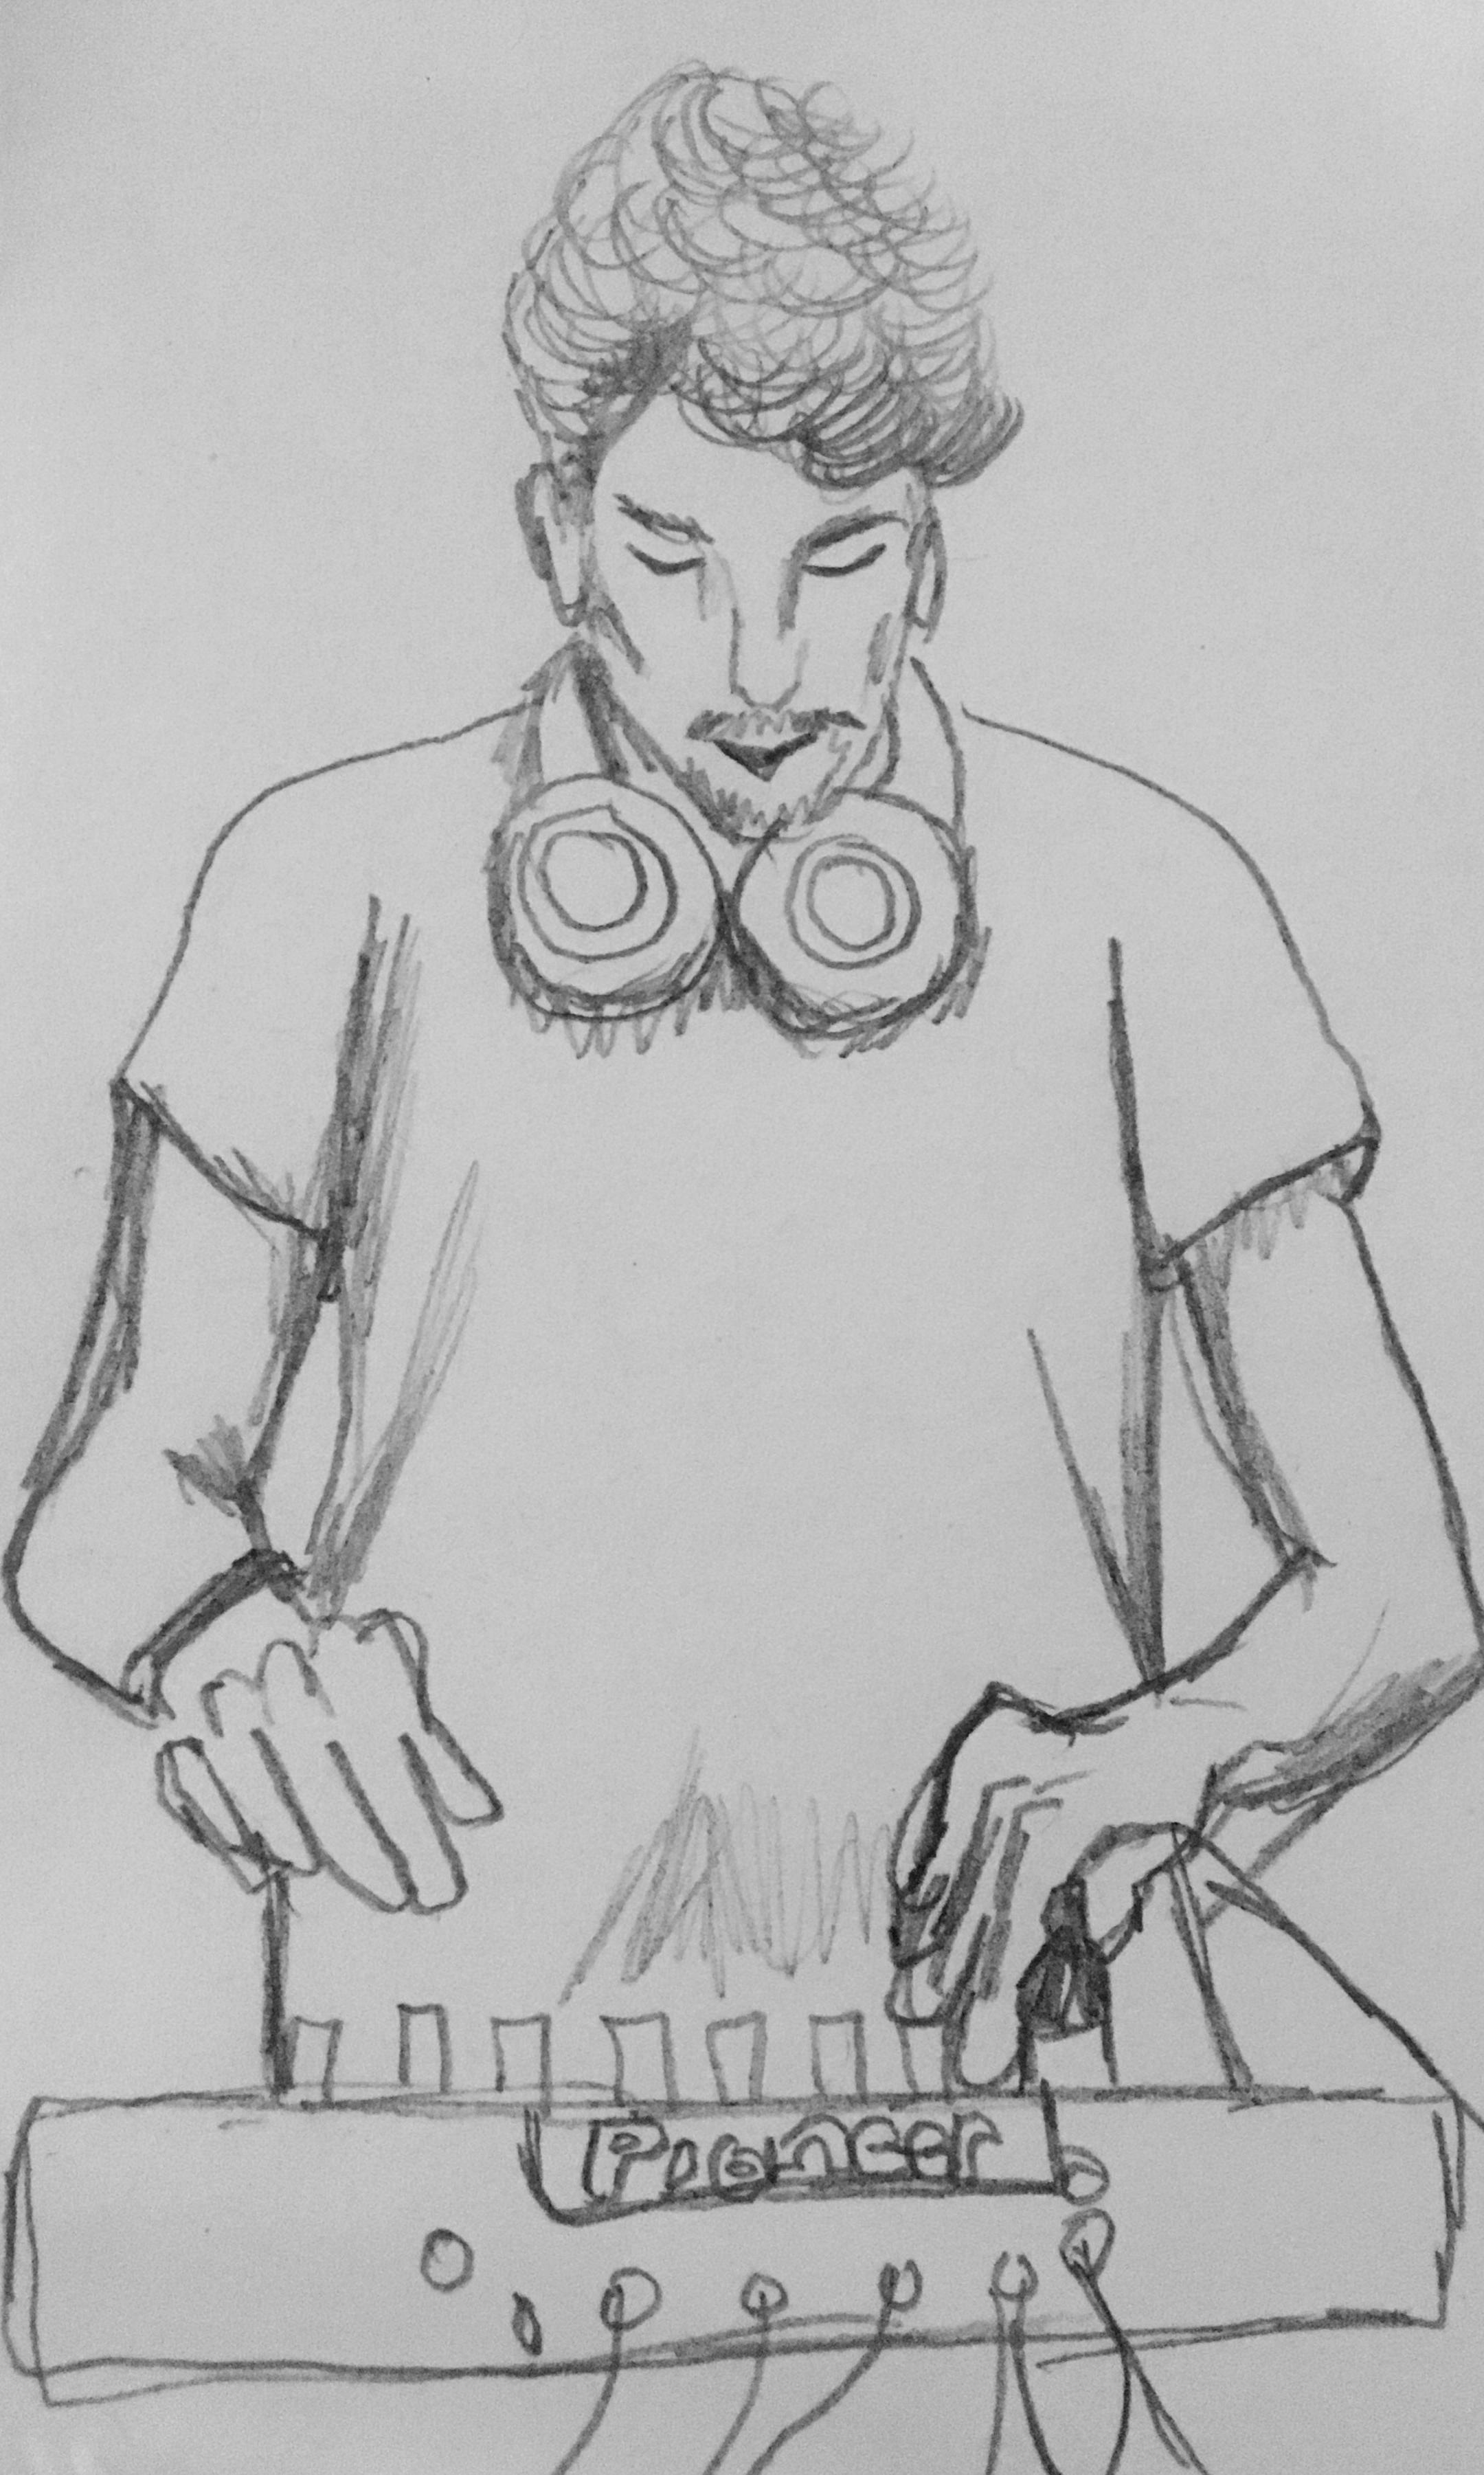 Initial sketch of Edwin Jonah Anamam